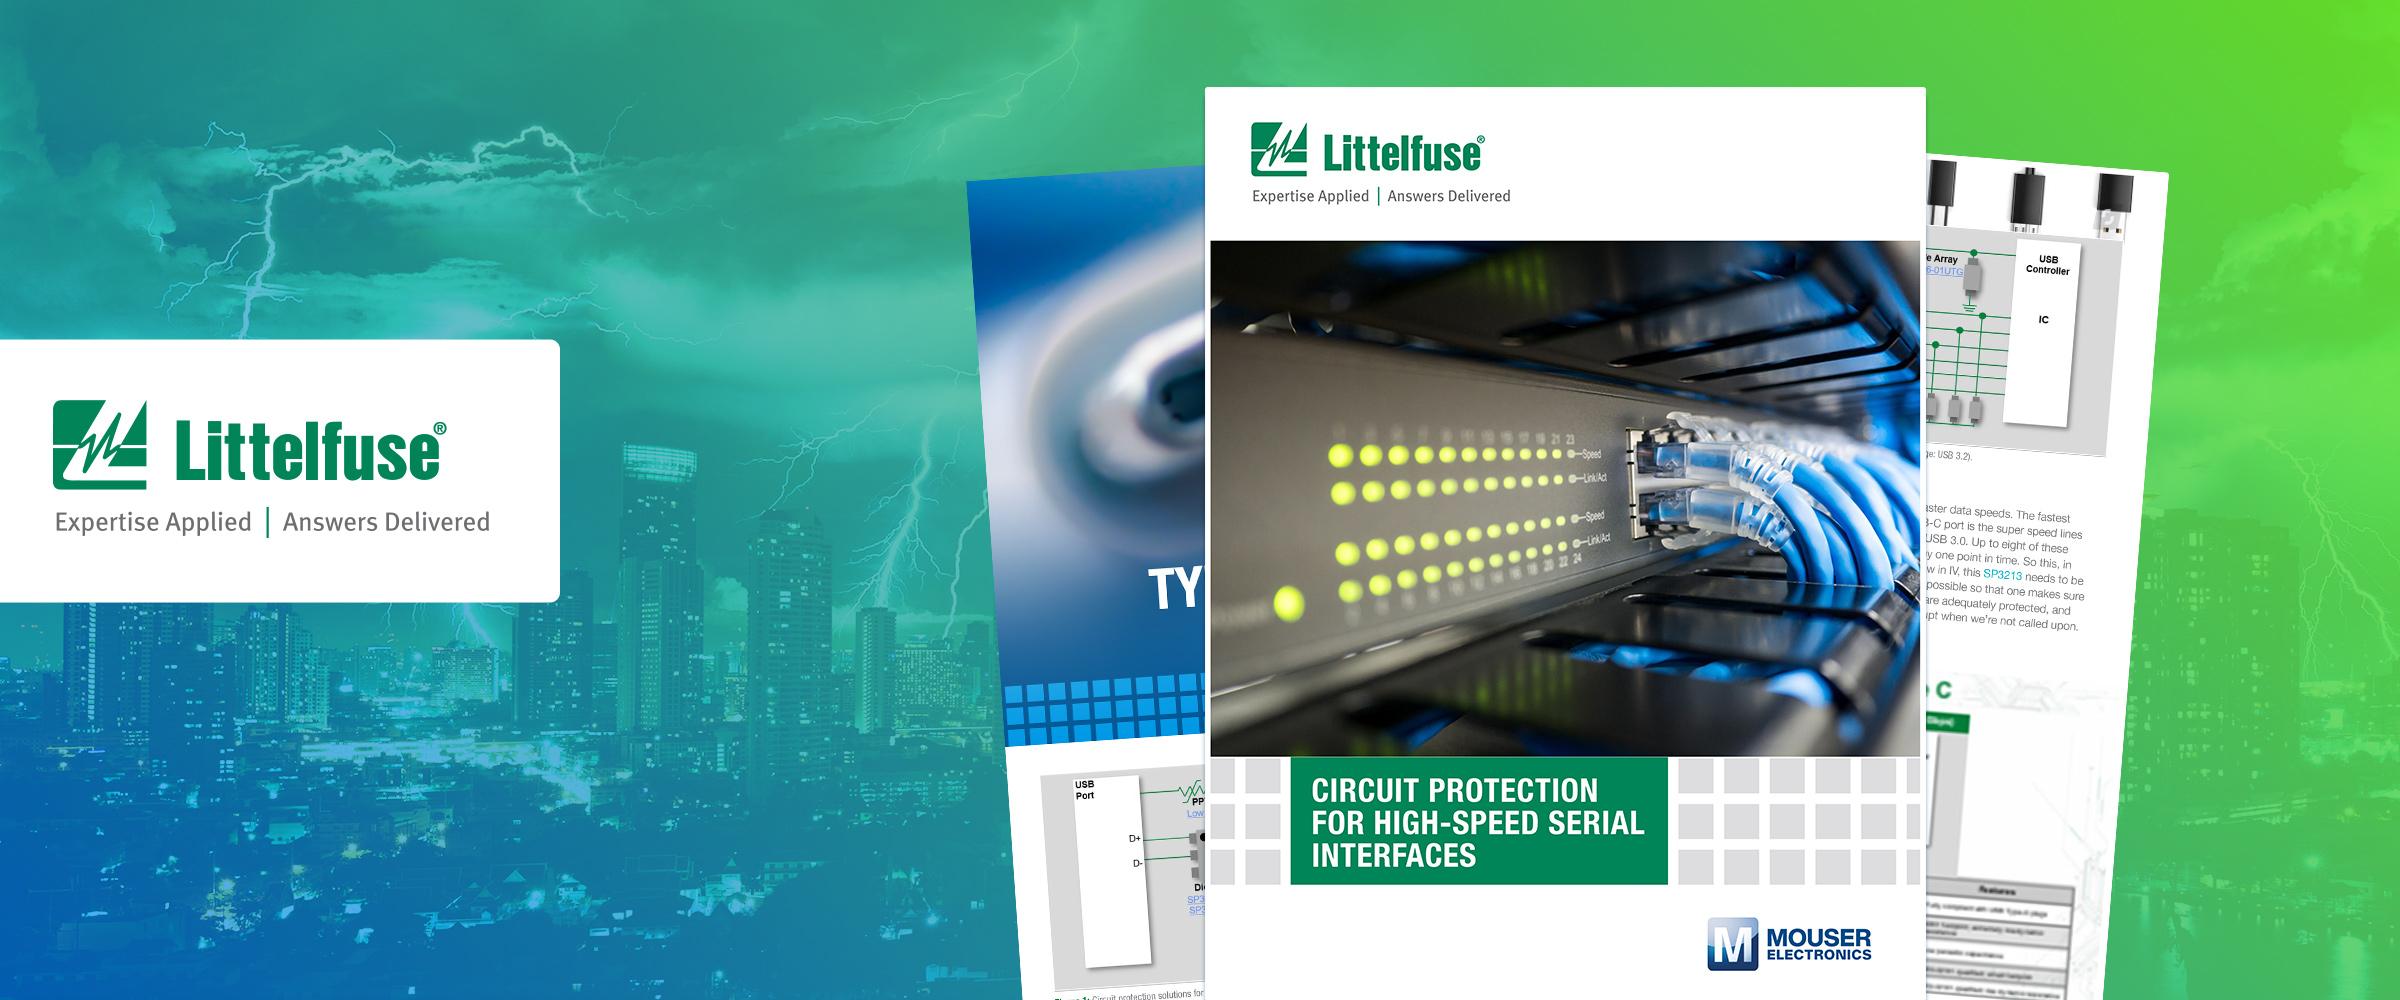 Littelfuse与贸泽联手发布新电子书-探索用于保护电气网络和电路的解决方案